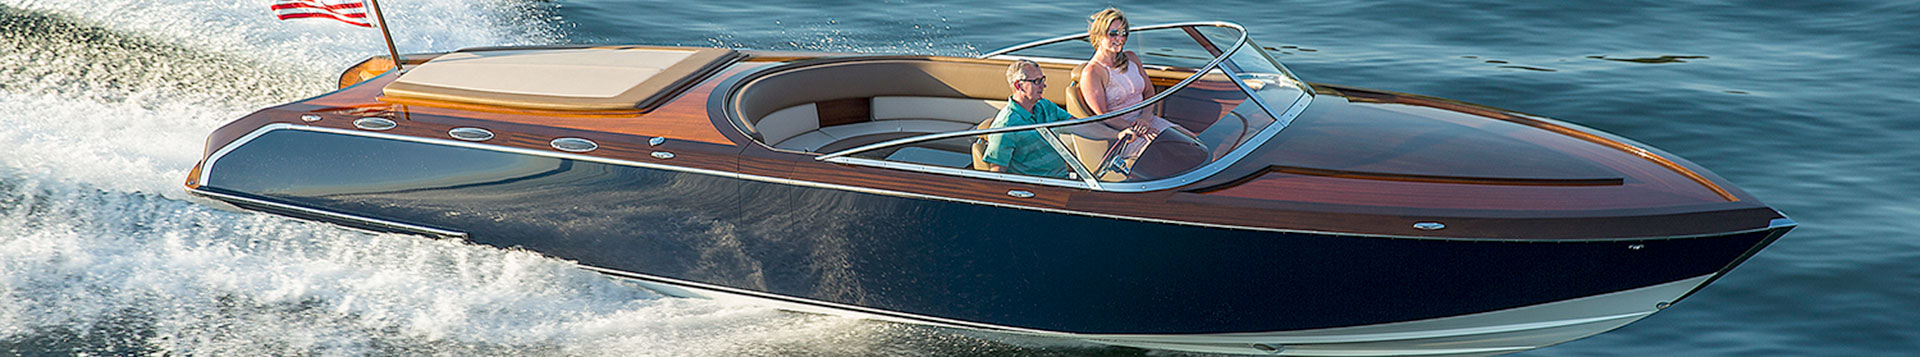 Coeur Custom, Pure 340, Custom Wood Boat